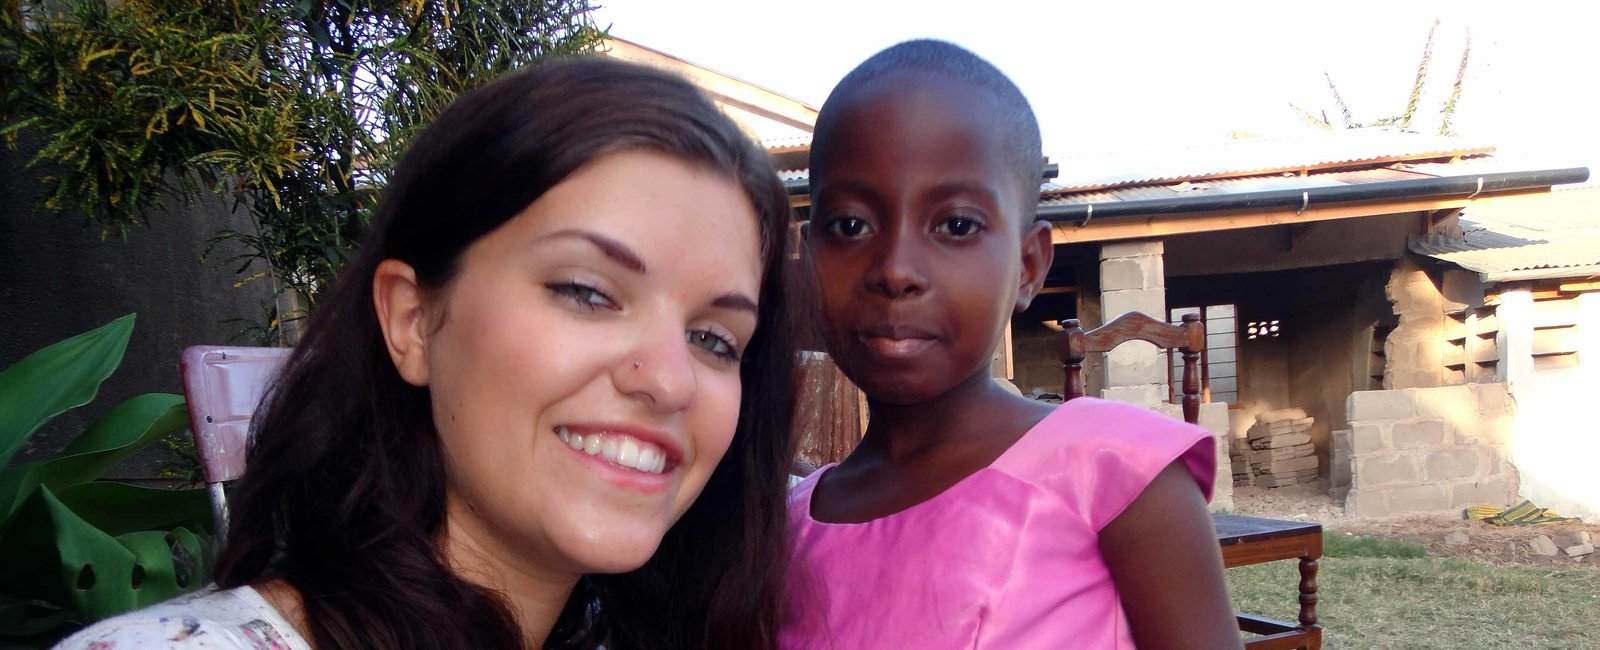 Harriet Bloom - Midwifery Electives in Tanzania Dar es Salaam